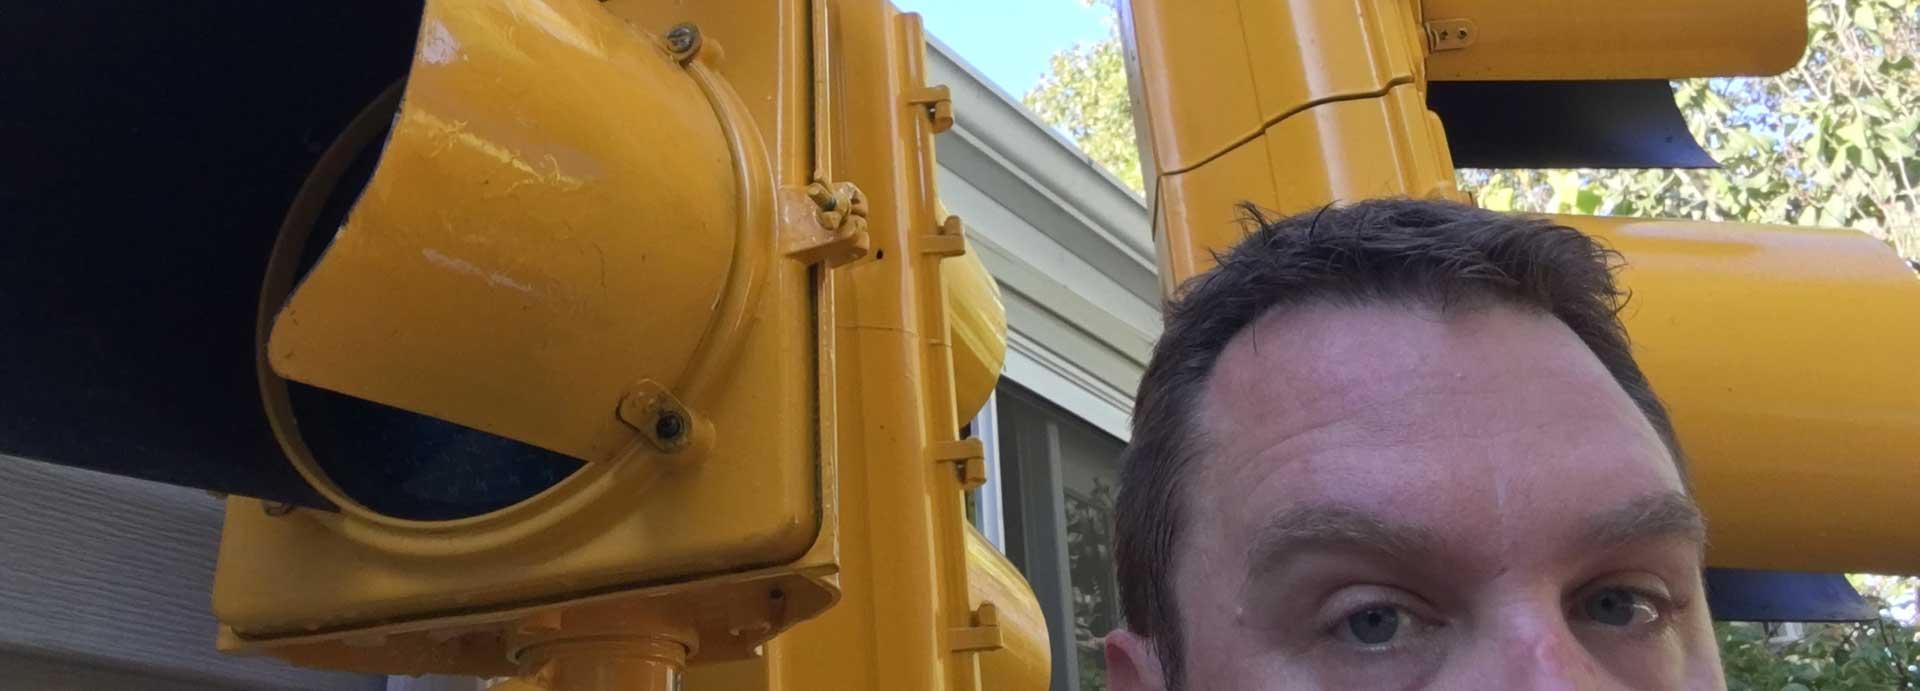 traffic light cluster behind me